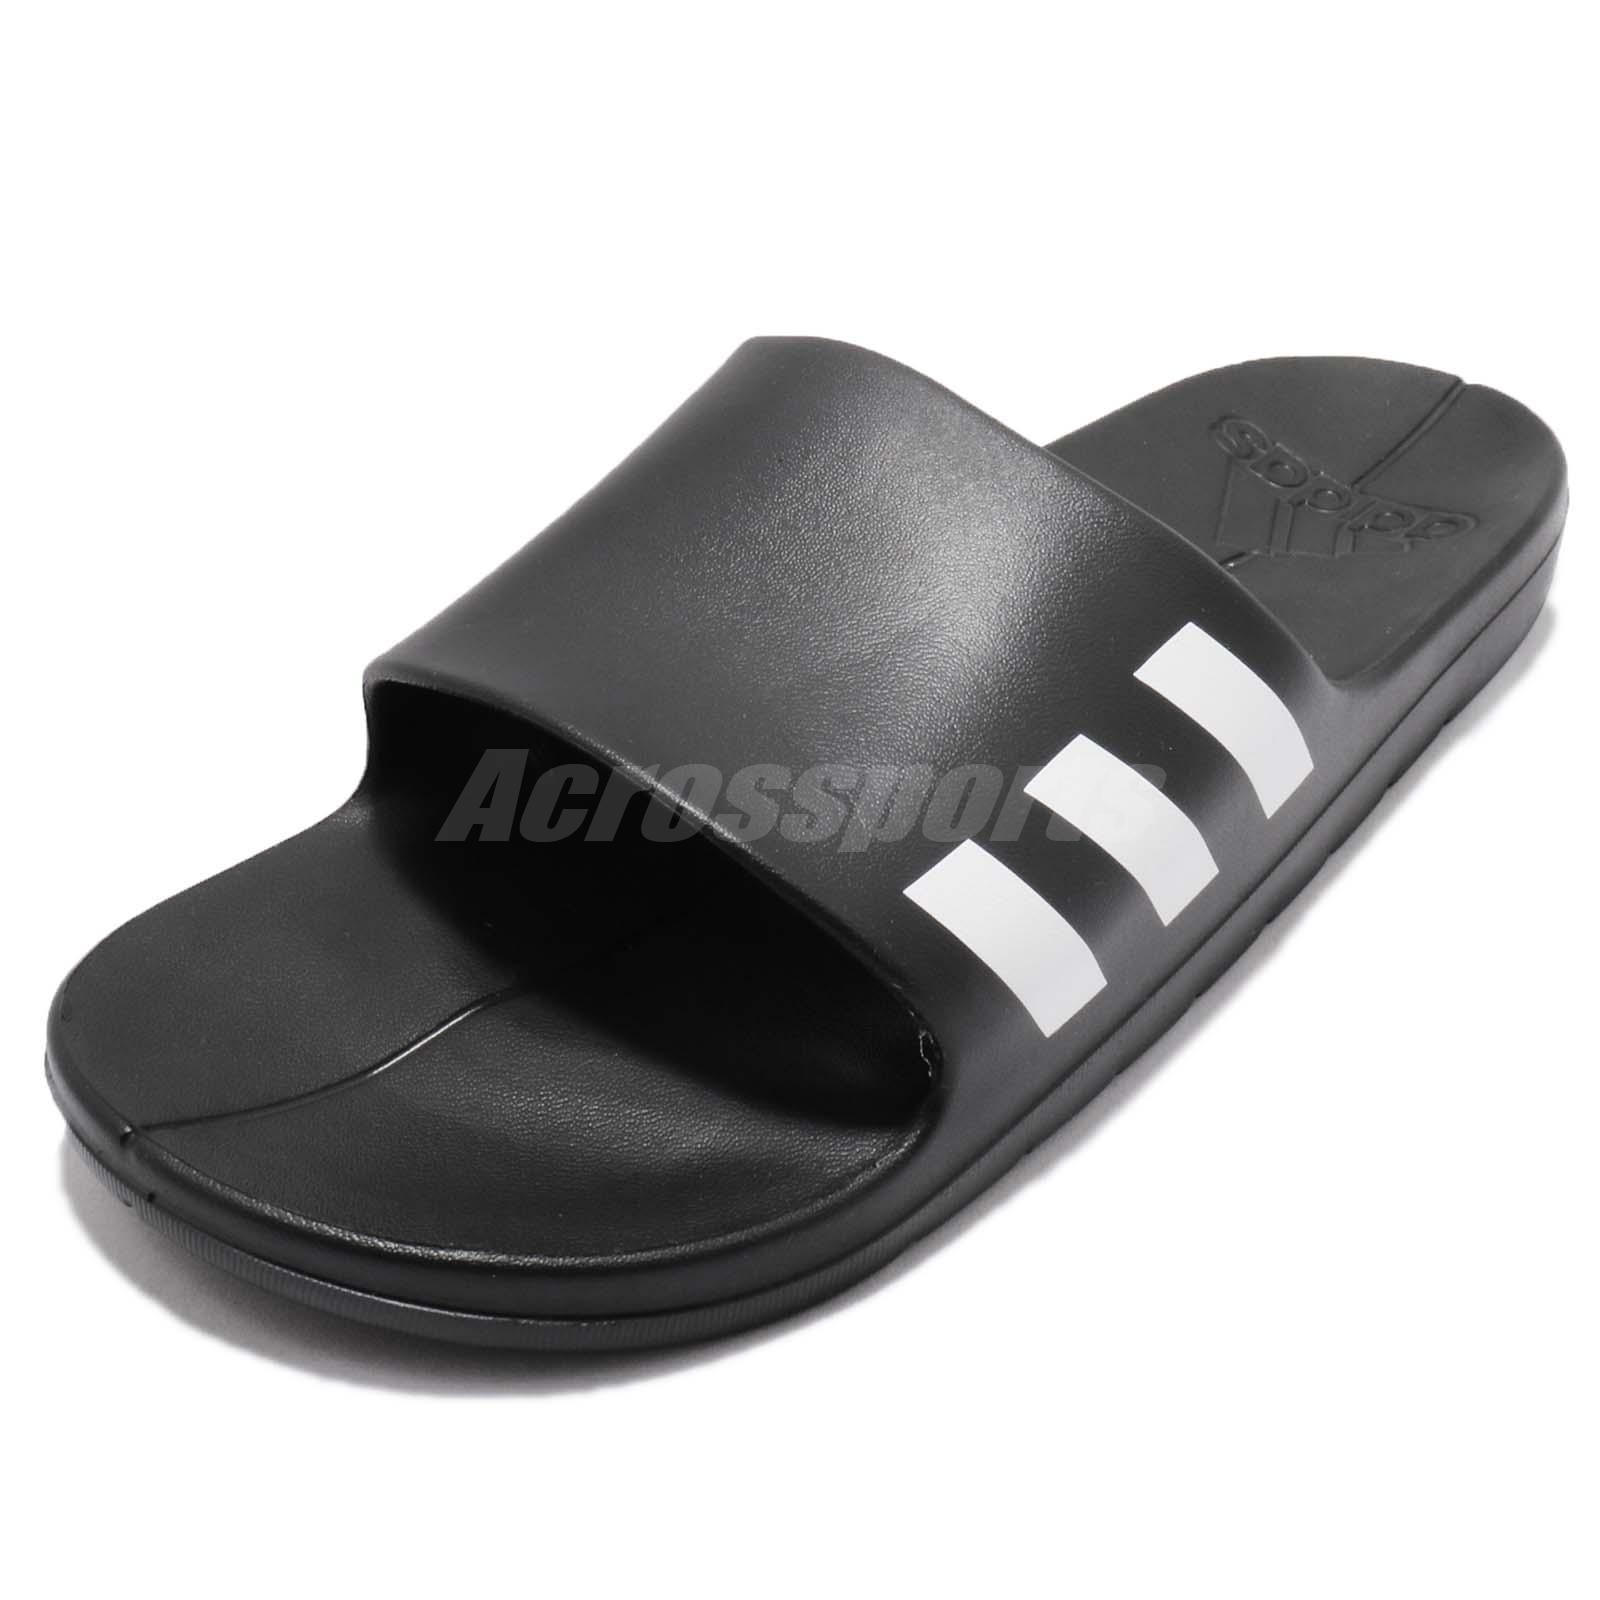 e7783b2c105e8f adidas Aqualette Core Black White Men Women Sandal Slippers Slides CG3540